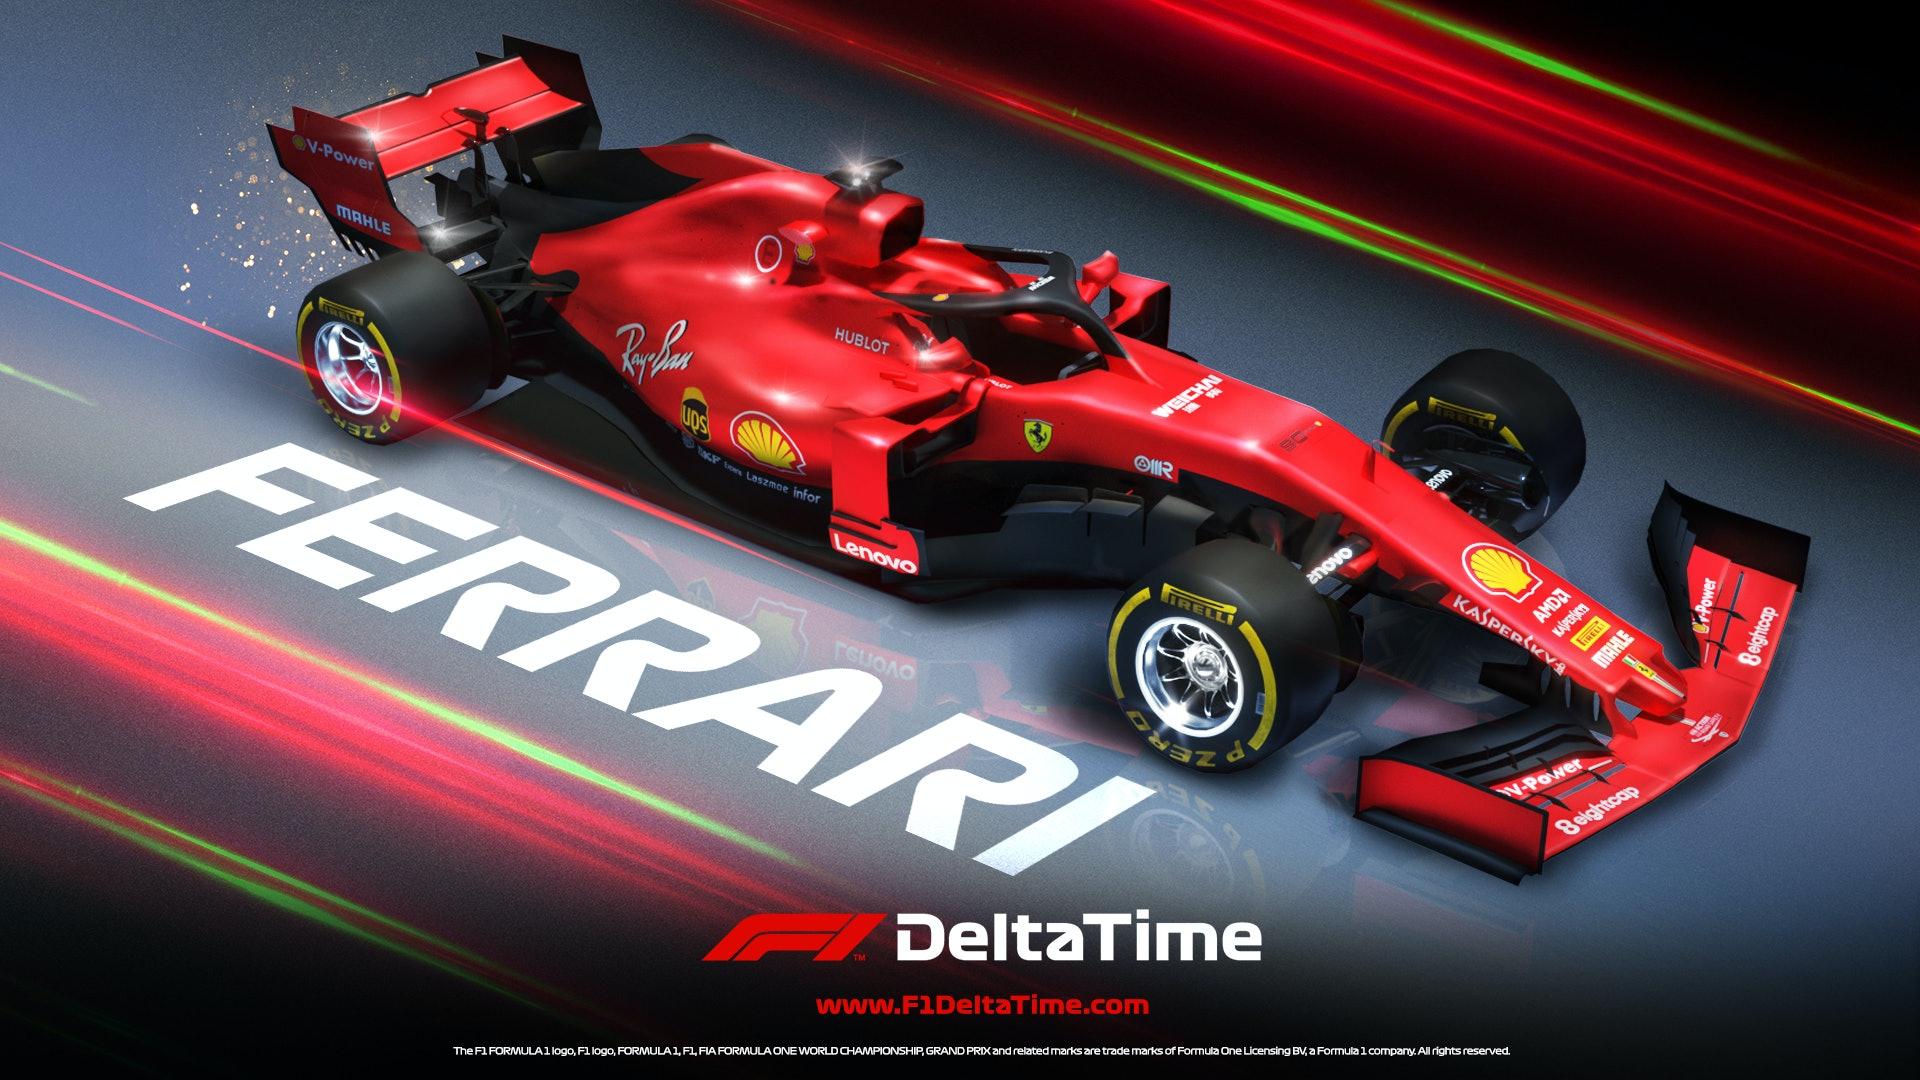 F1 Delta Time的遊戲資產,全部可透過NFT進行買賣。(Animoca Brands提供)